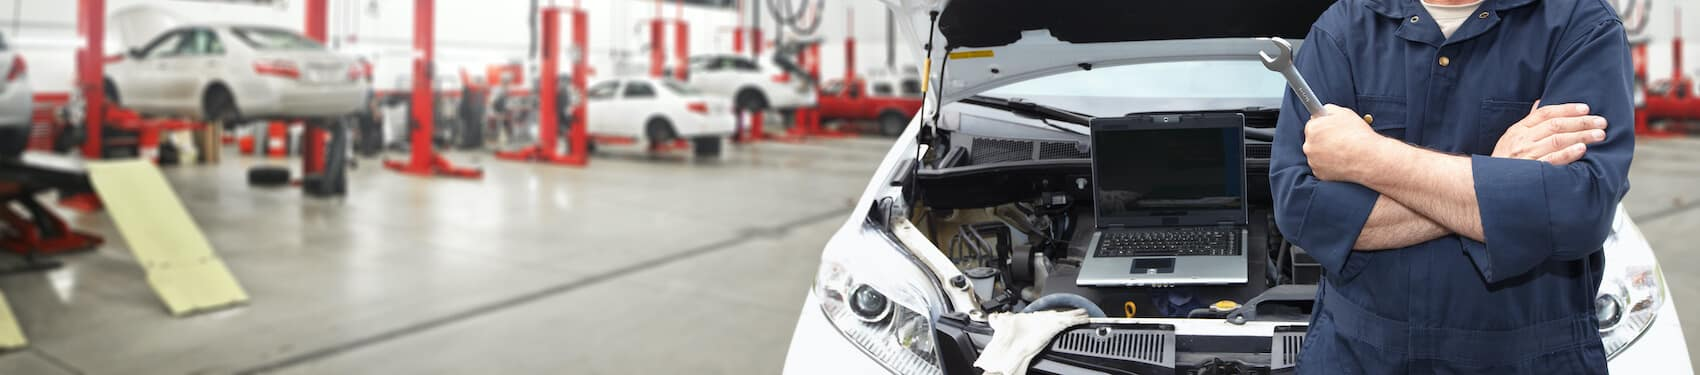 automotive service faq